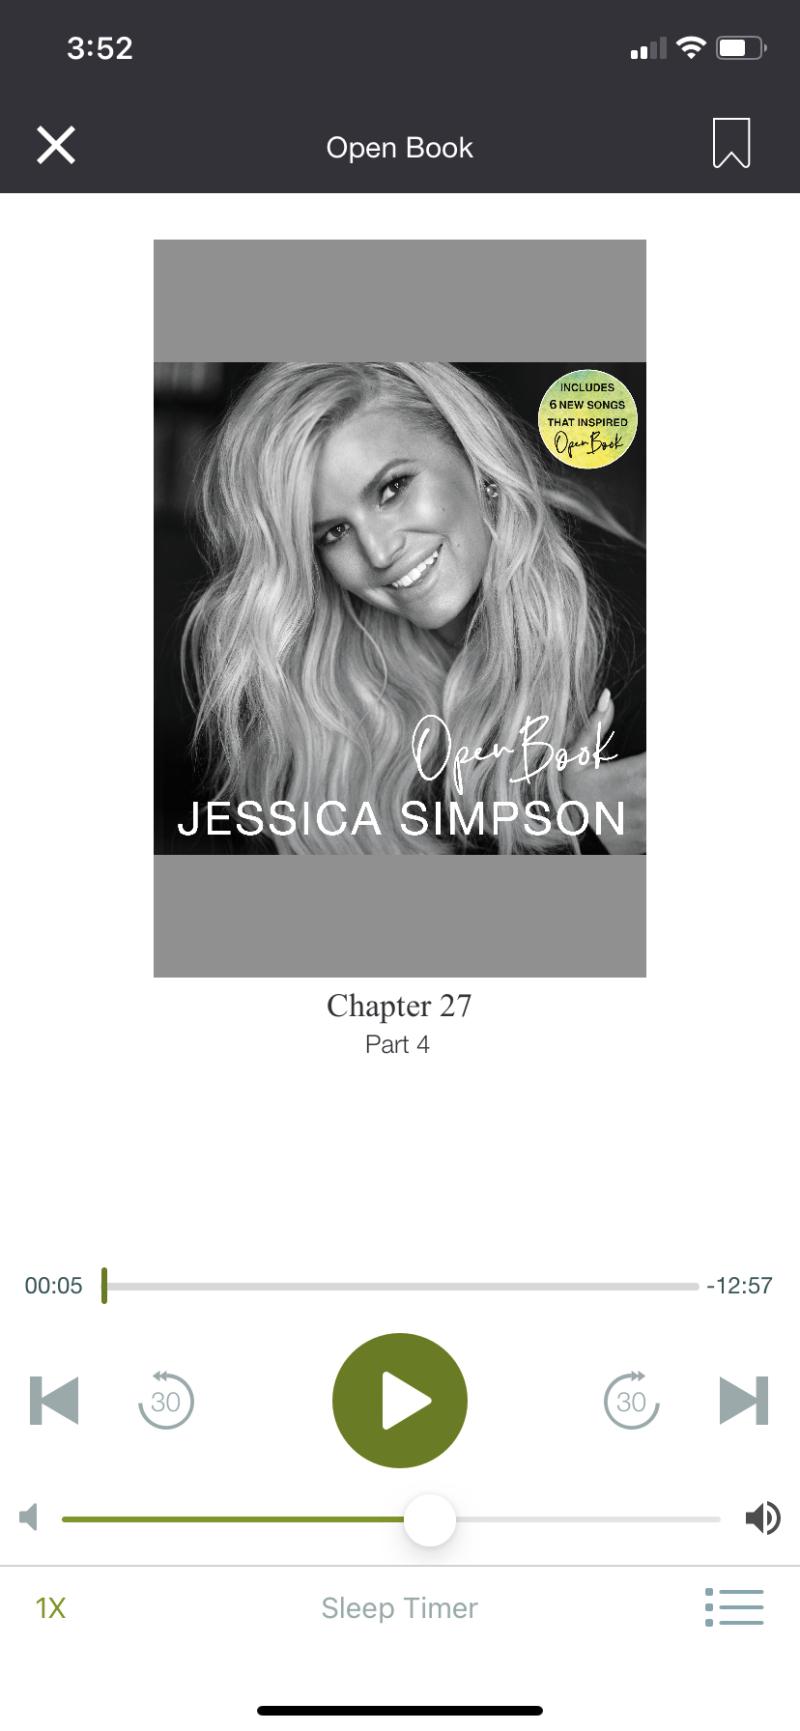 Jessica simpson open book audio book